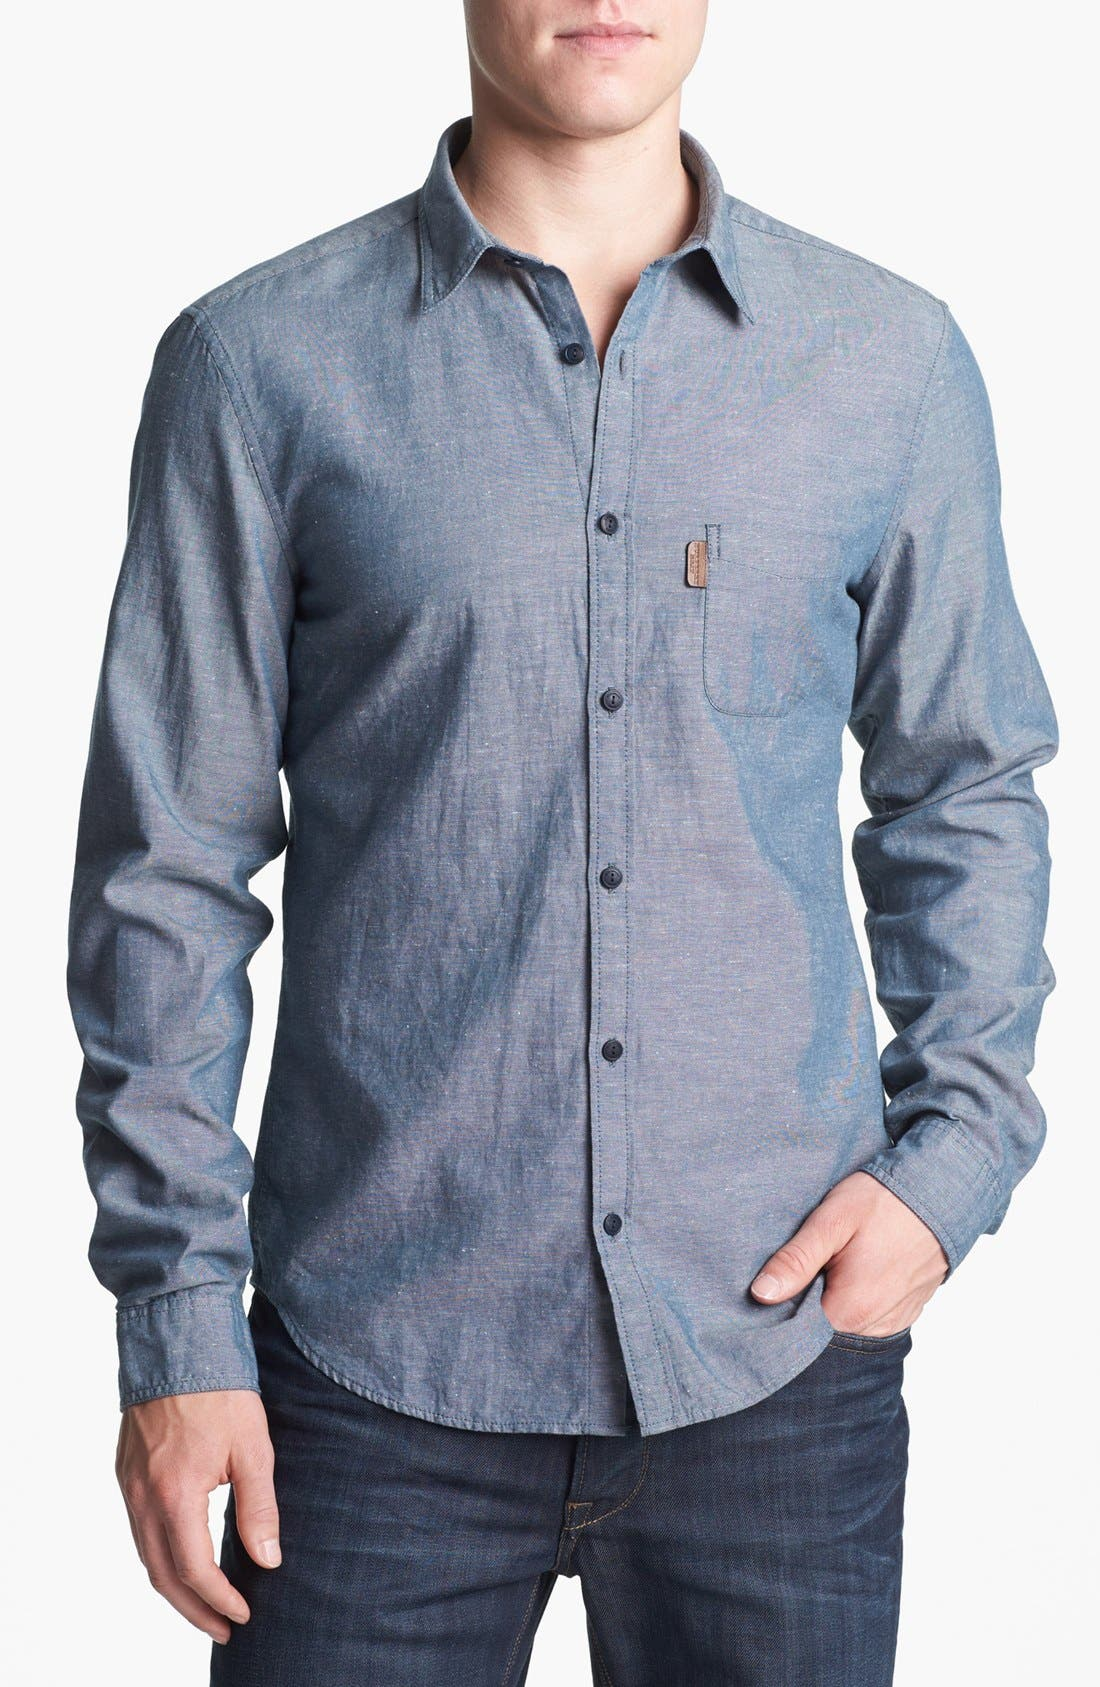 Alternate Image 1 Selected - Burberry Brit 'Adken' Trim Fit Cotton Blend Sport Shirt